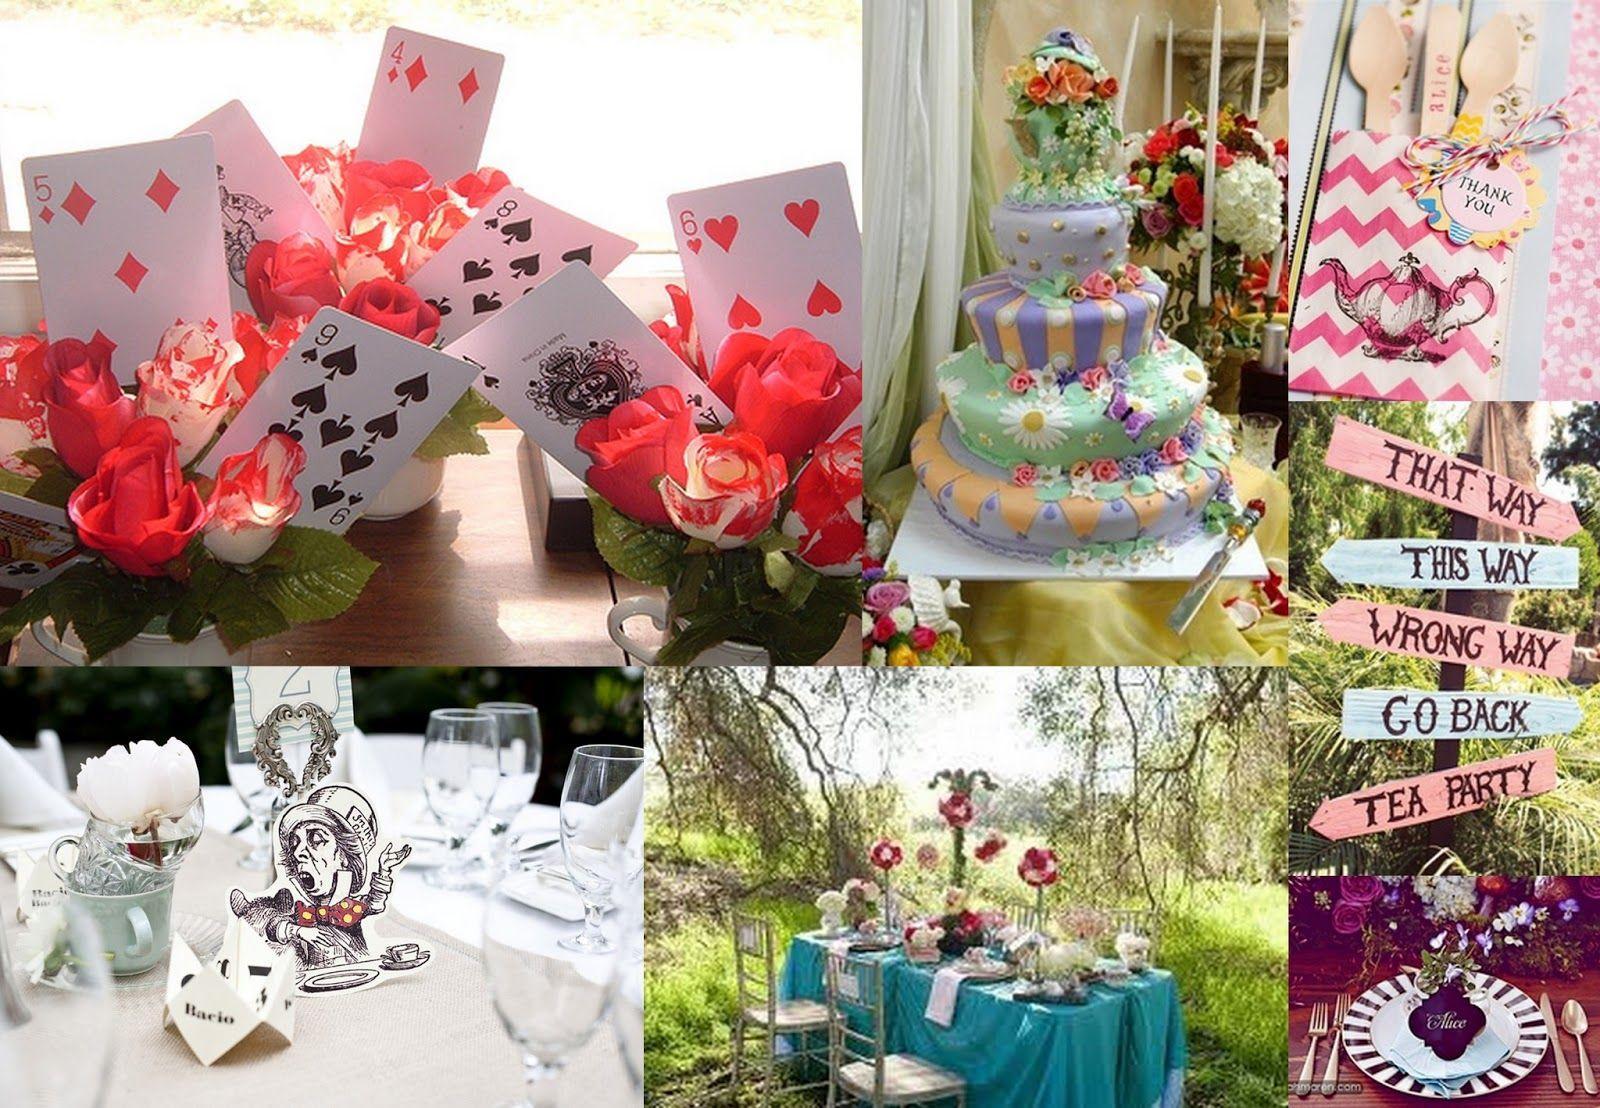 Alice in Wonderland Wedding - Wacky or Wonderful? | Maybe Someday ...